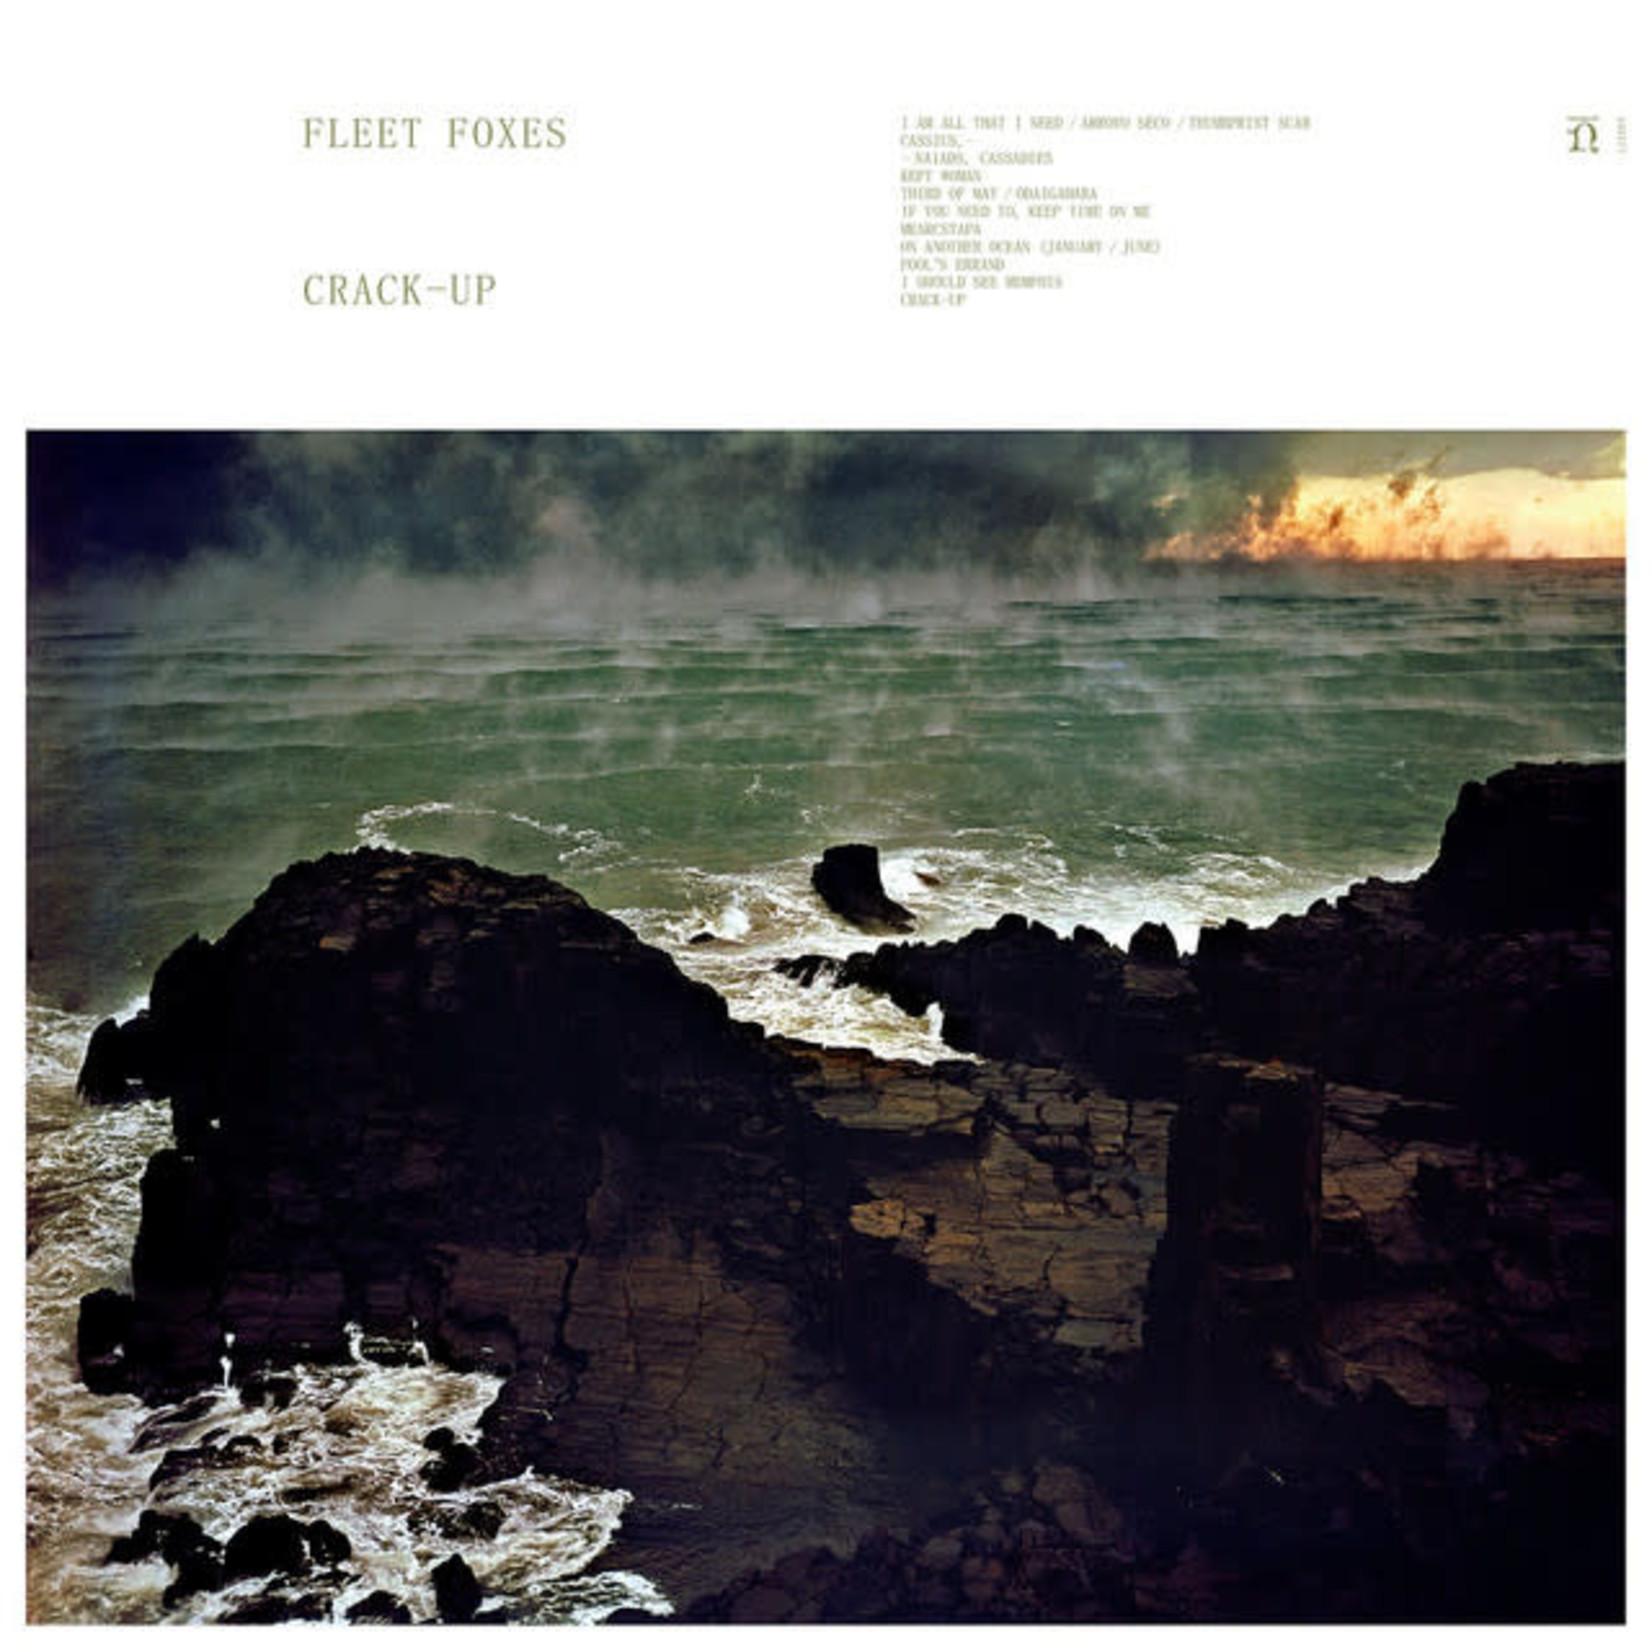 Vinyl Fleet Foxes - Crack-Up